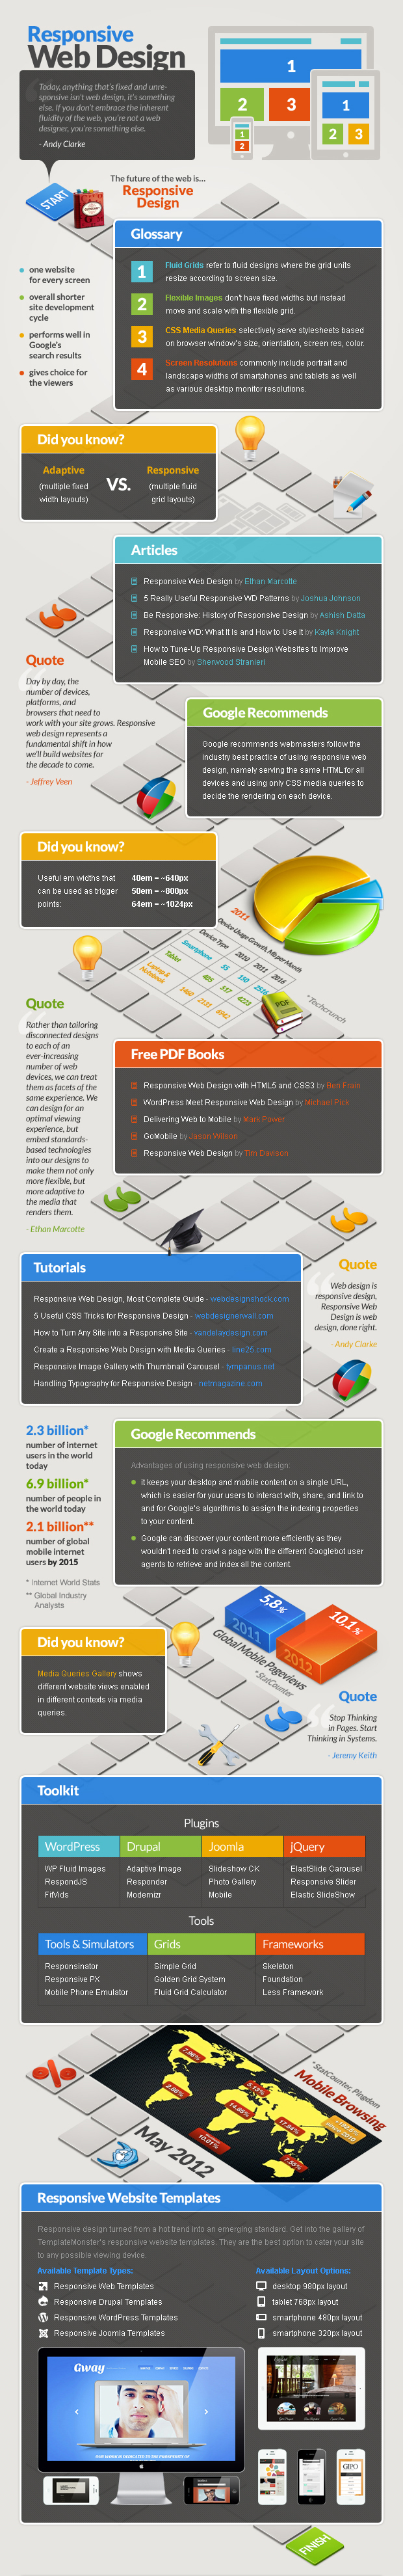 Responsive Web Design Interactive Guide on Board